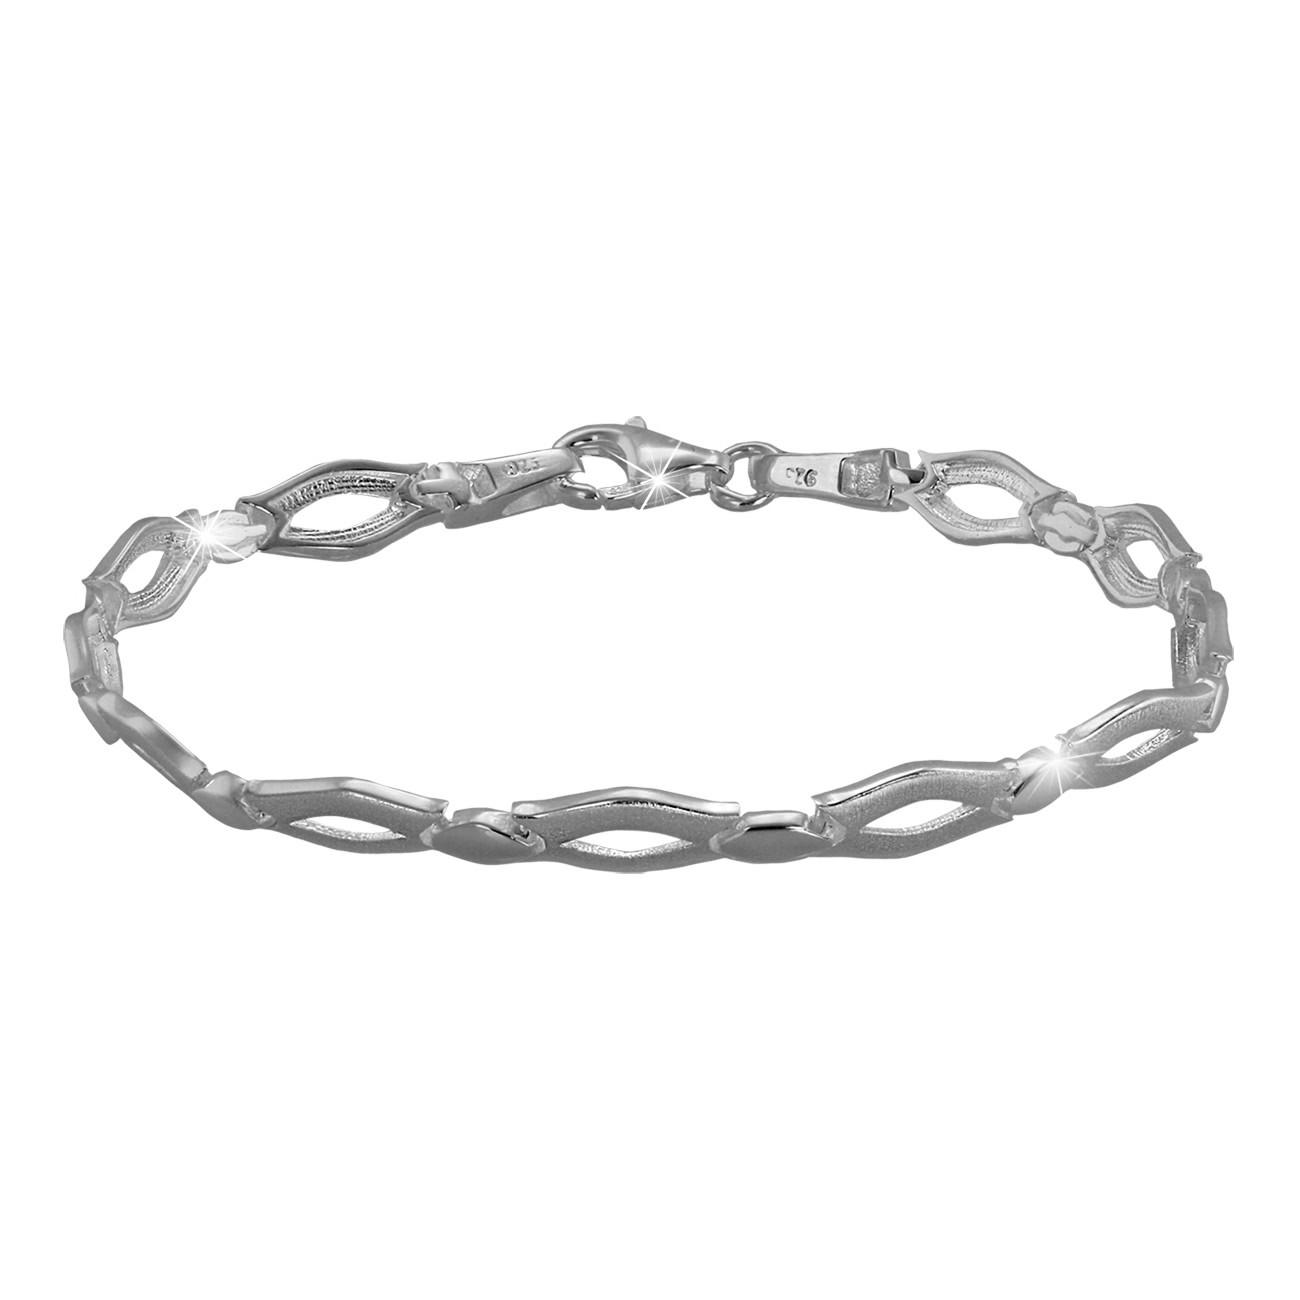 SilberDream Armband Outline matt/glänzend 925 Sterling Silber 19,3cm SDA456J